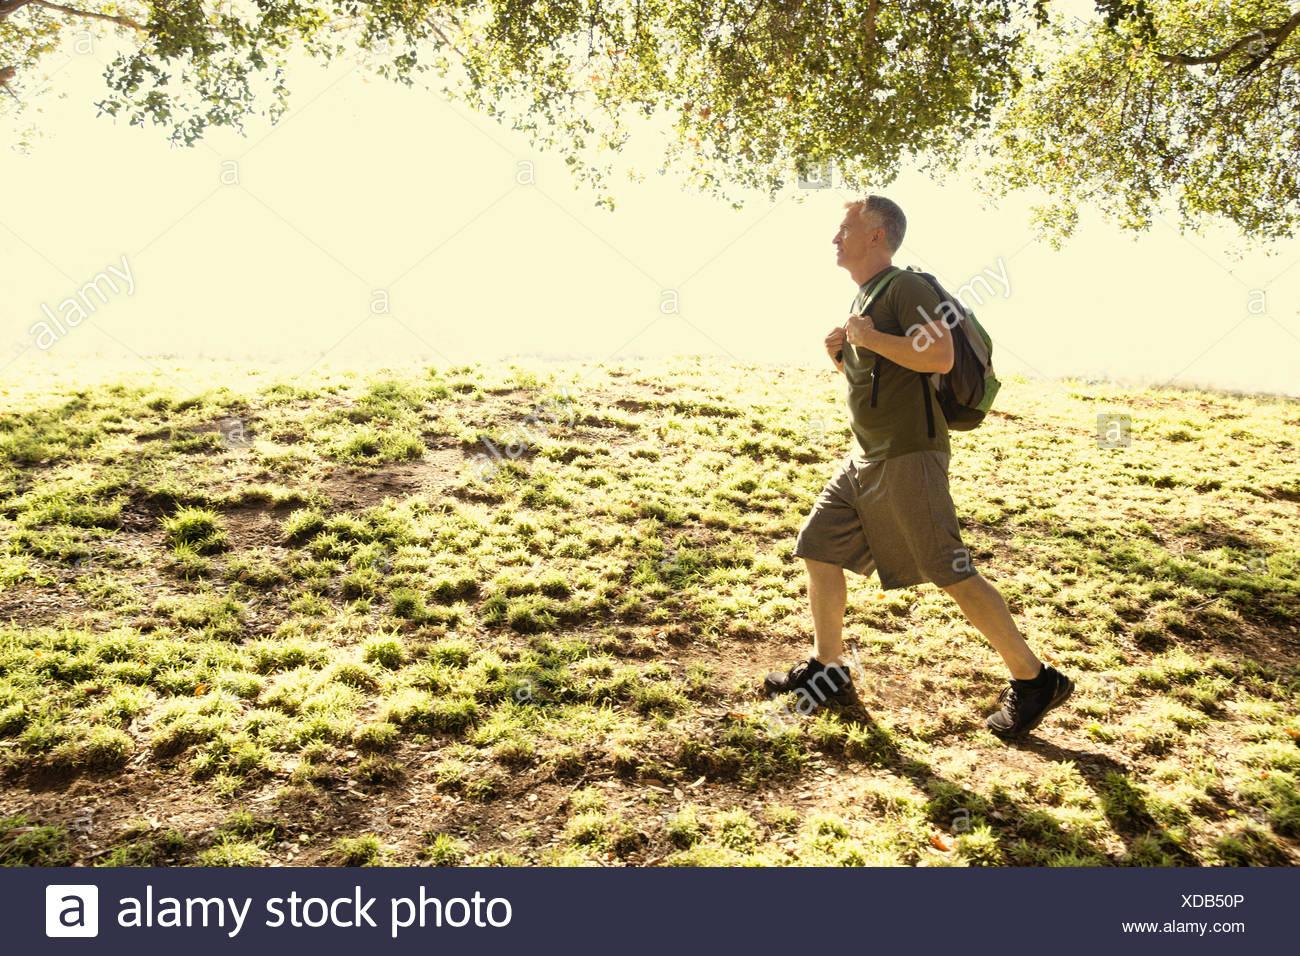 Mature man power walking in park - Stock Image